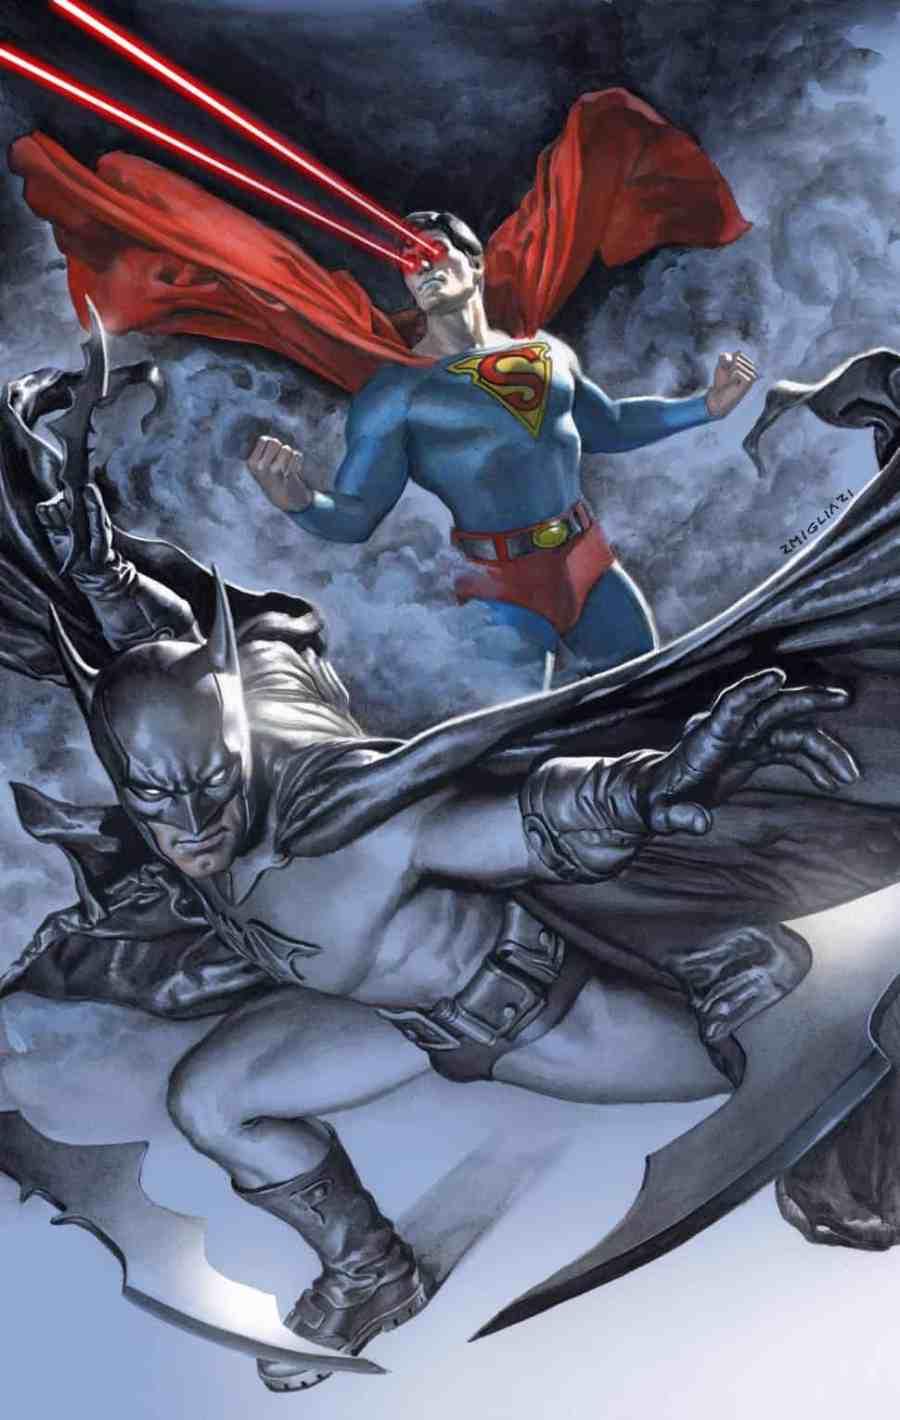 Batman Superman #17 Review | The Aspiring Kryptonian